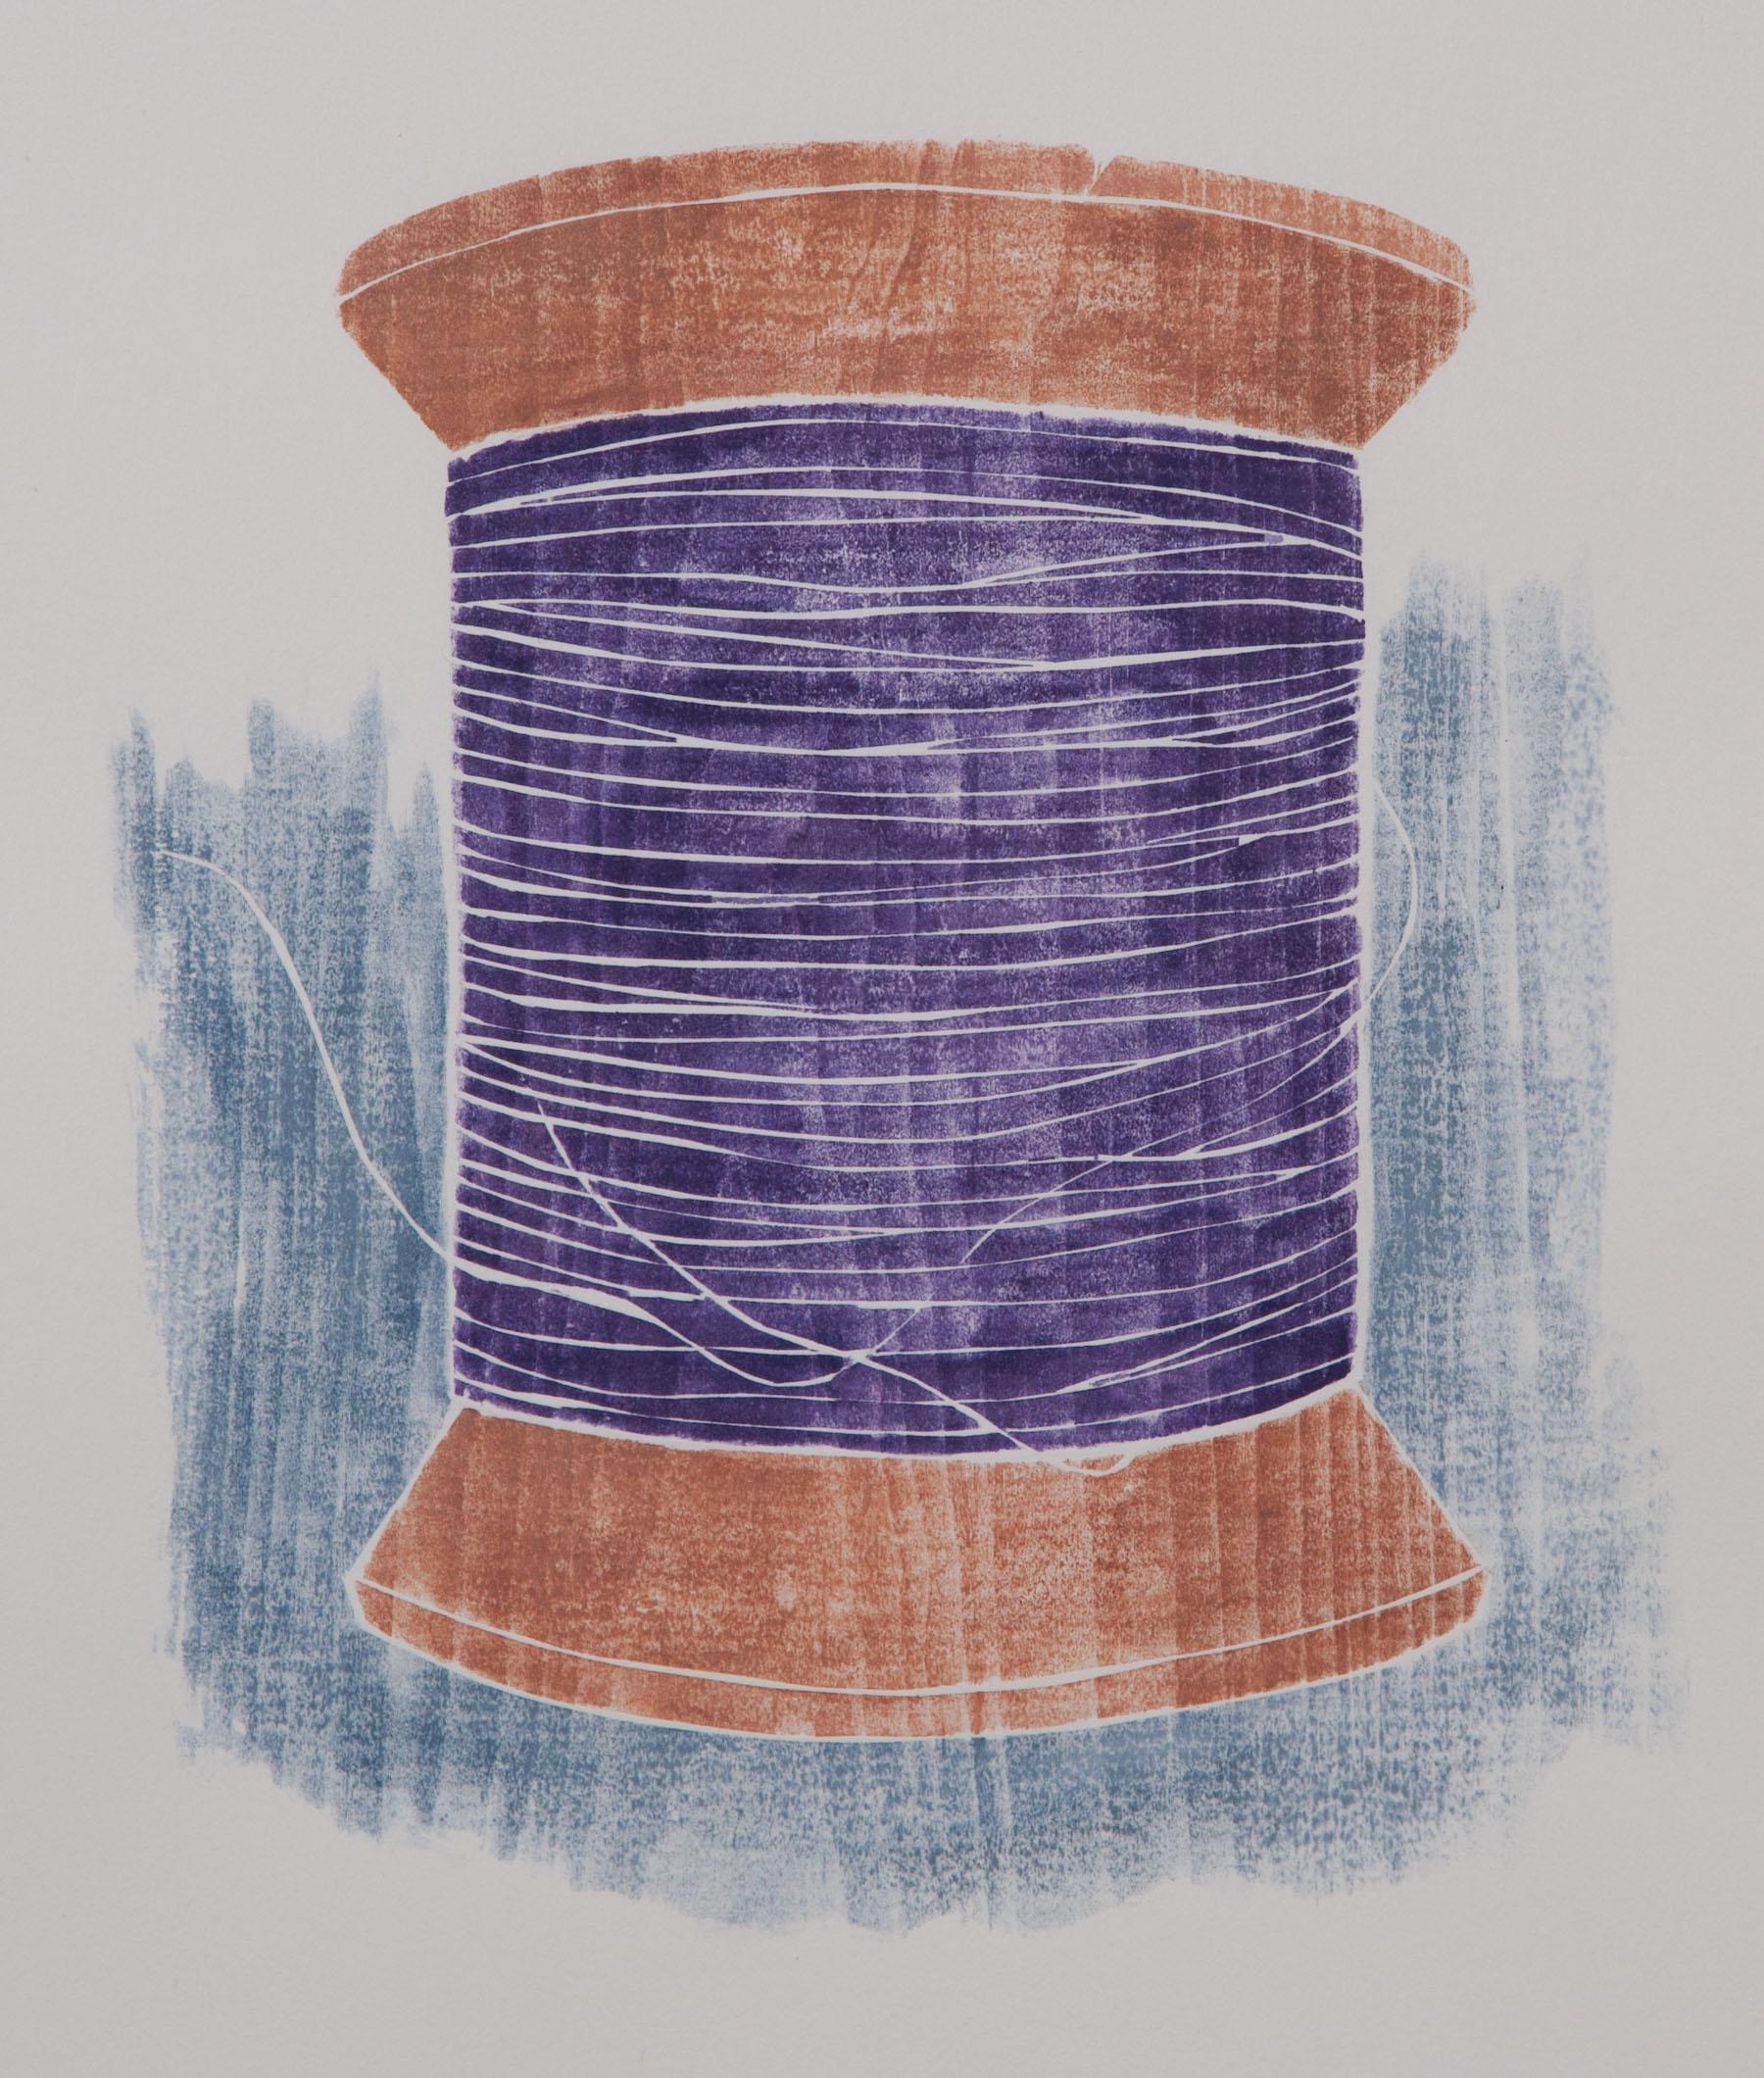 """Old Spool"", white line woodcut, 10"" x 9"", $350 (framed)"